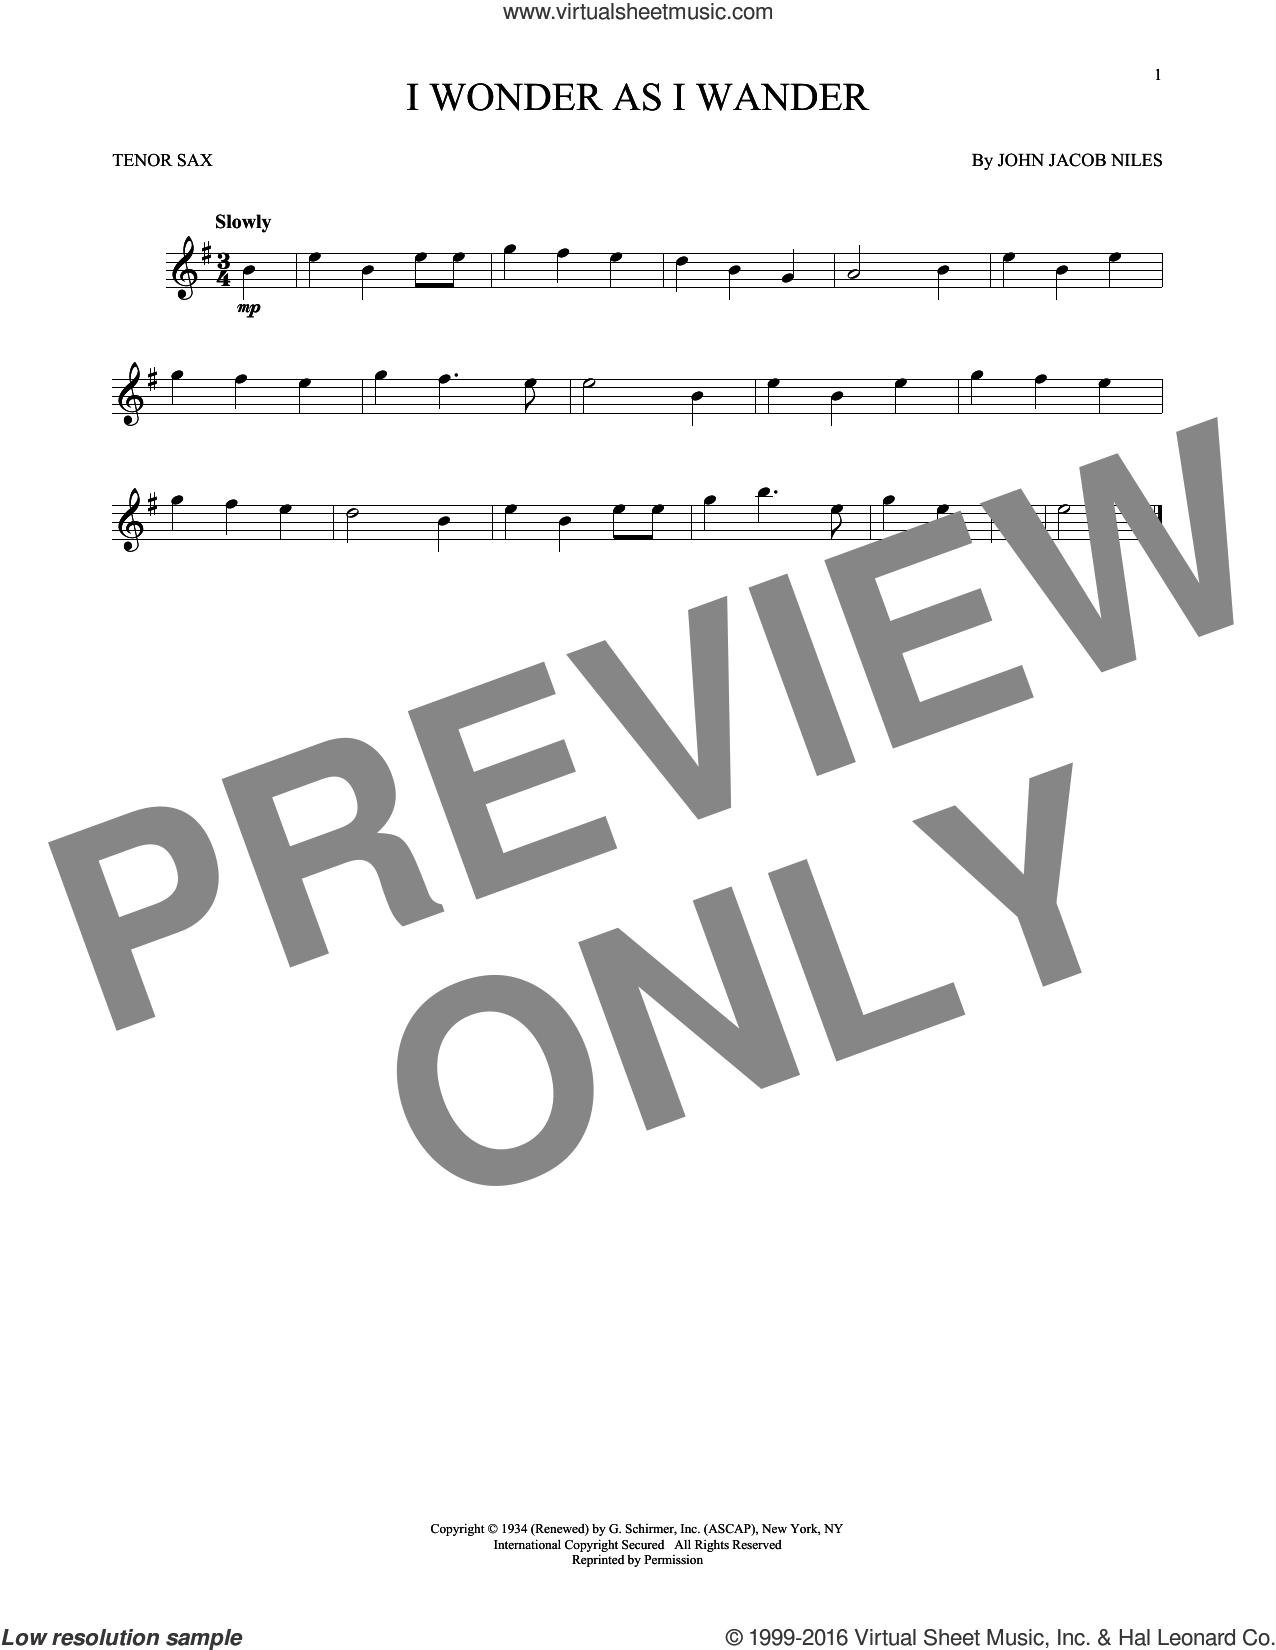 I Wonder As I Wander sheet music for tenor saxophone solo by John Jacob Niles, intermediate skill level